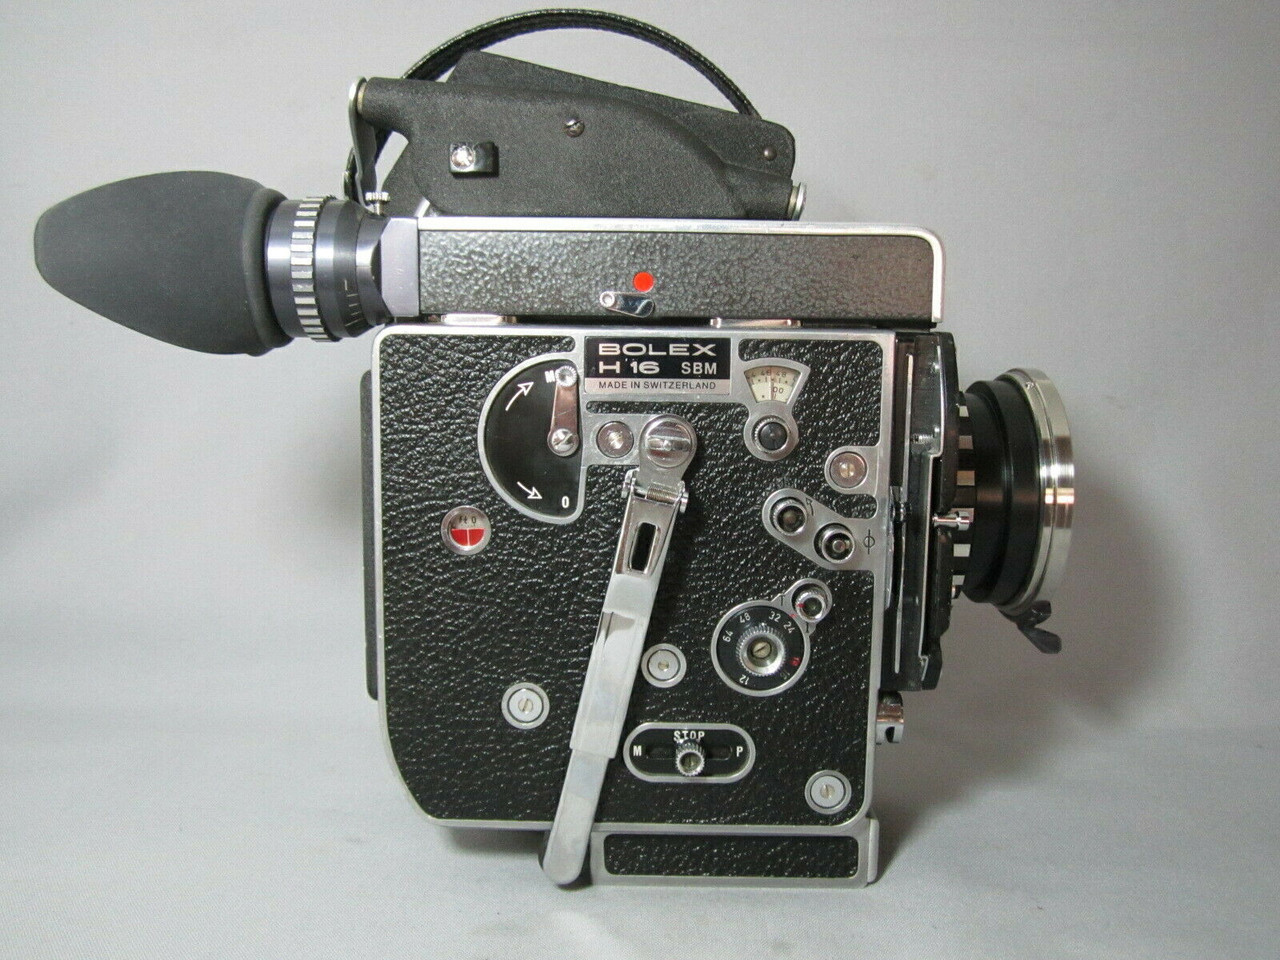 Super-16 PL-MOUNT Bolex SBM 13x Viewer 16mm Red Dot Movie Camera #2